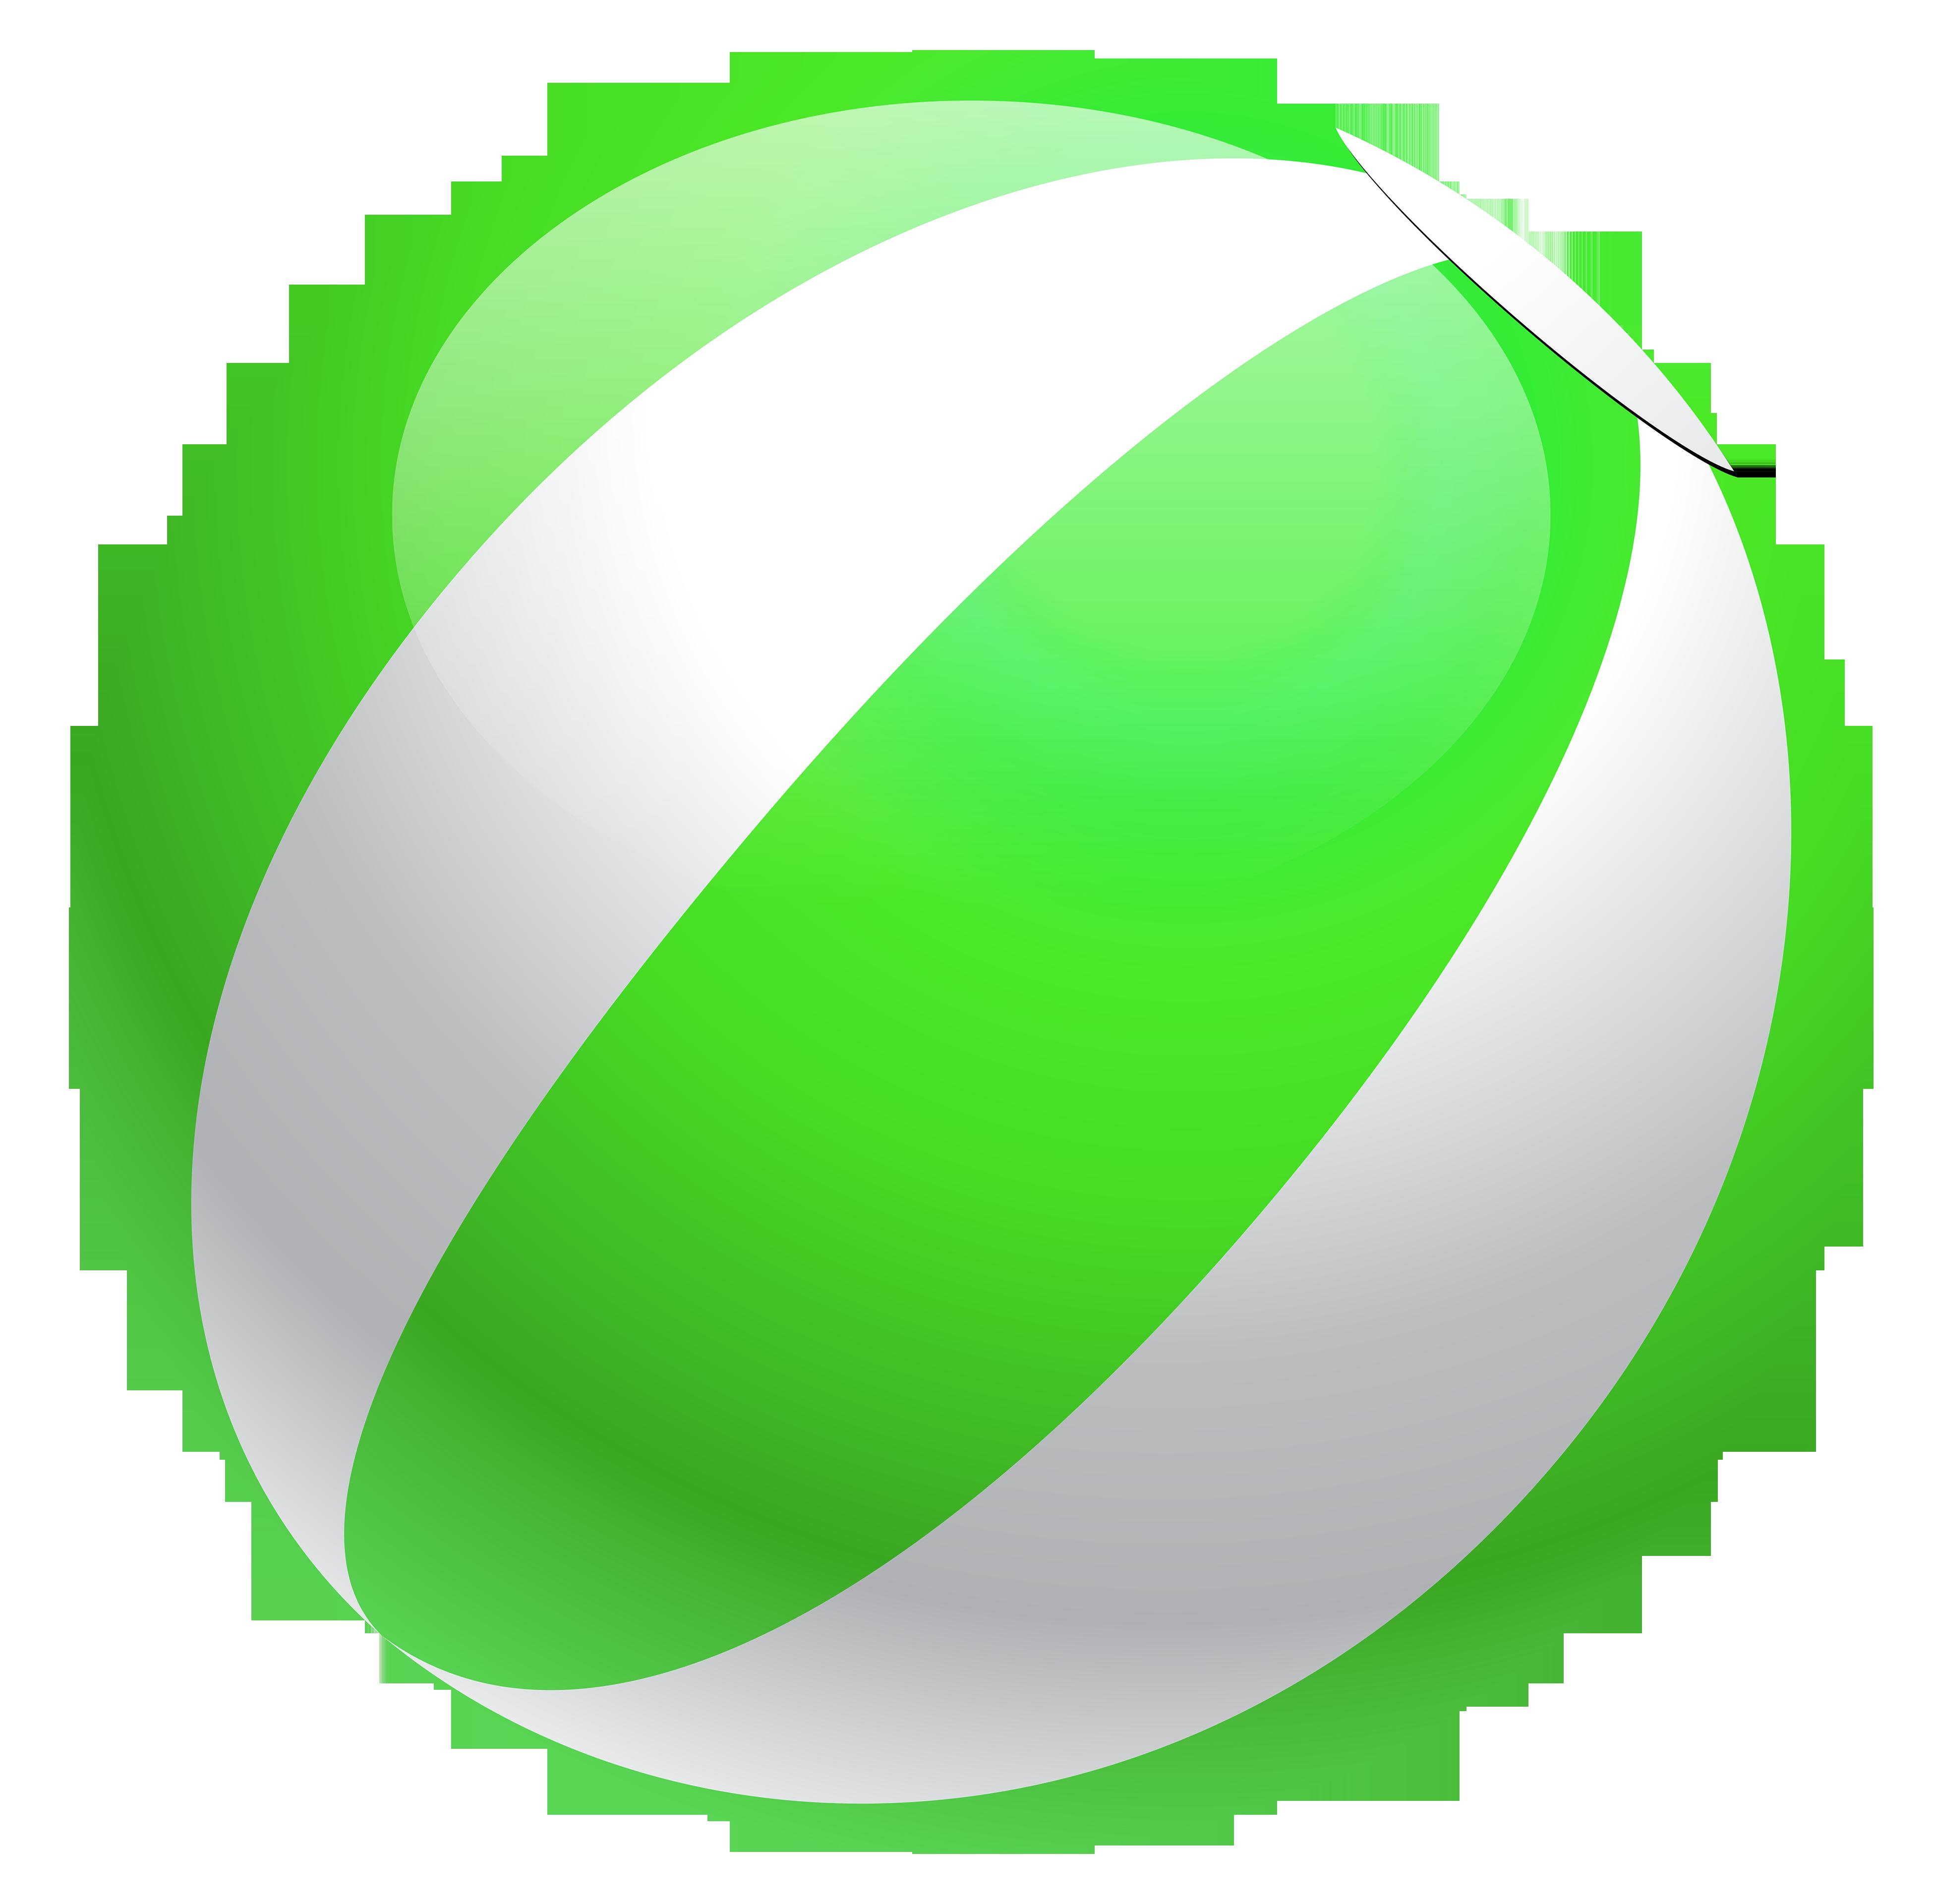 Beachball clipart balll. Transparent green beach ball